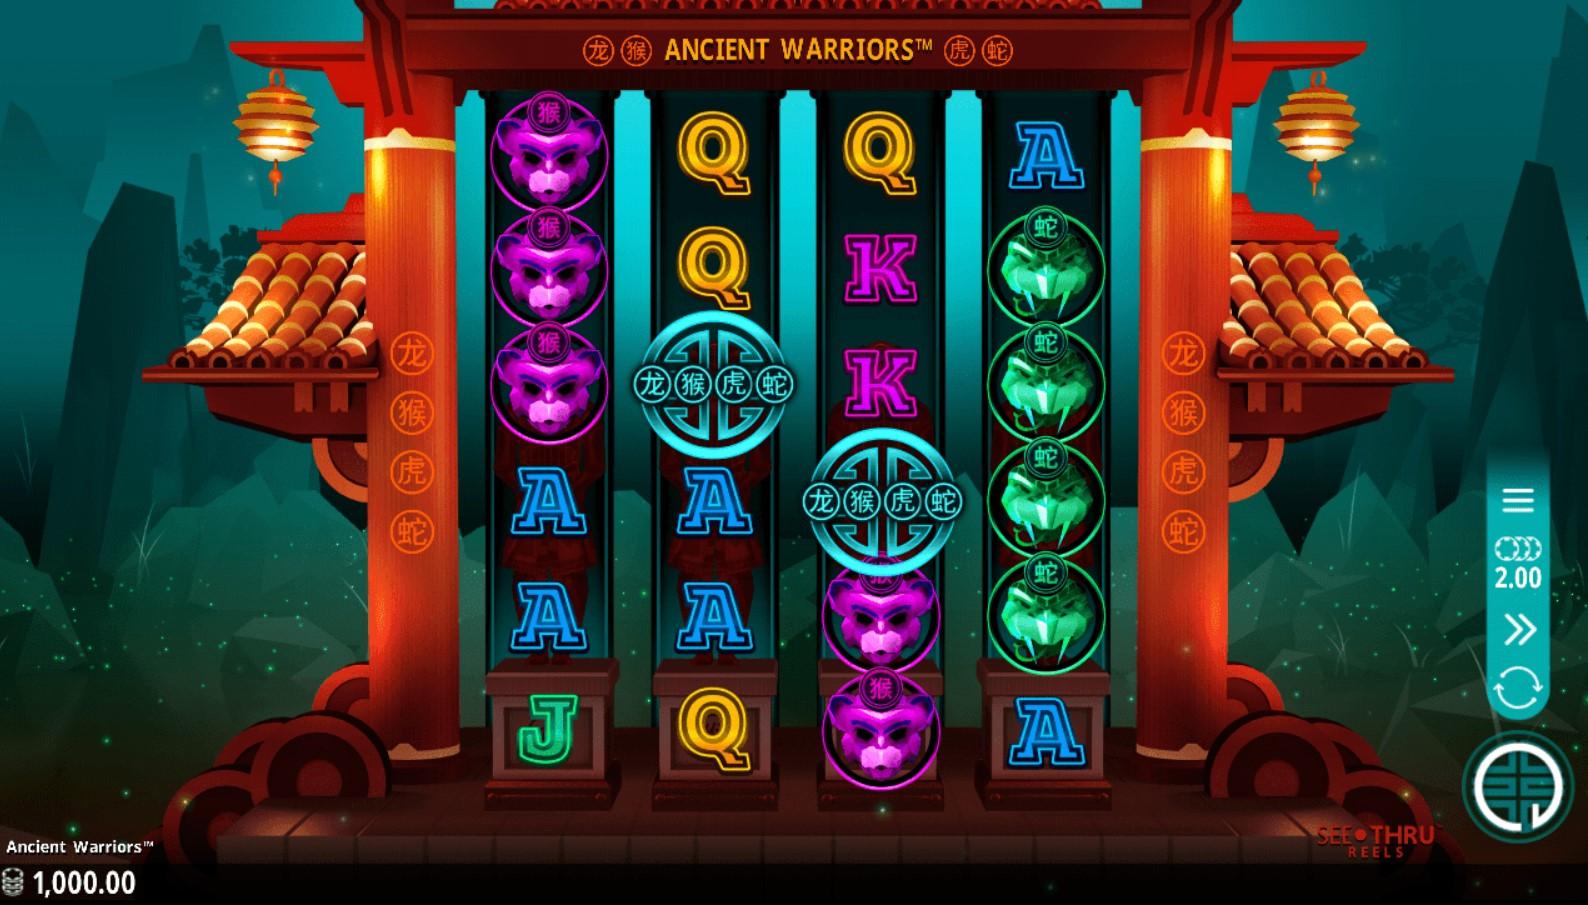 ancient-warriors-slot-gameplay